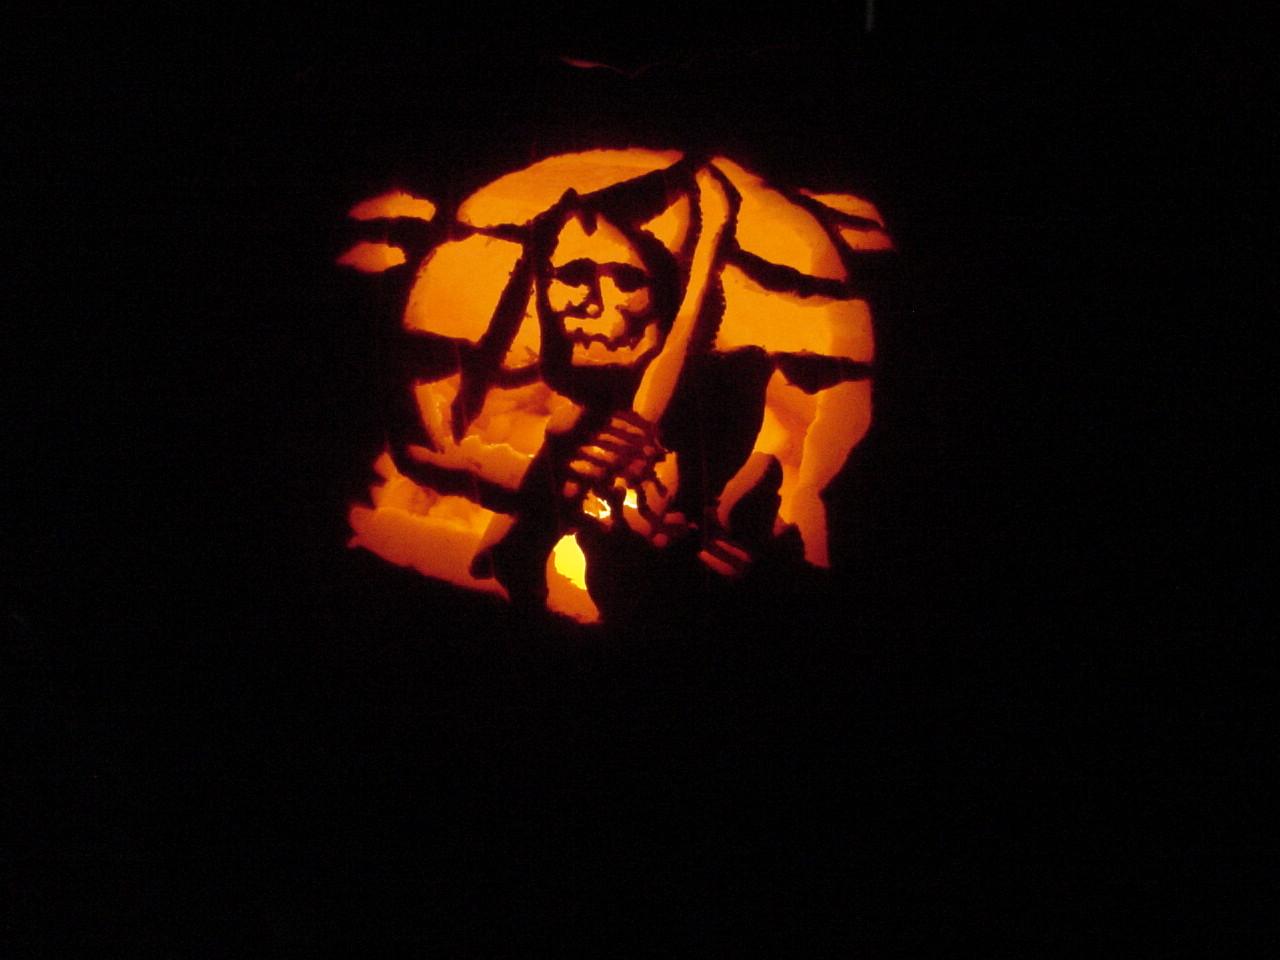 Grim Reaper Pumpkin Carving Patterns my Grim Reaper Pumpkin